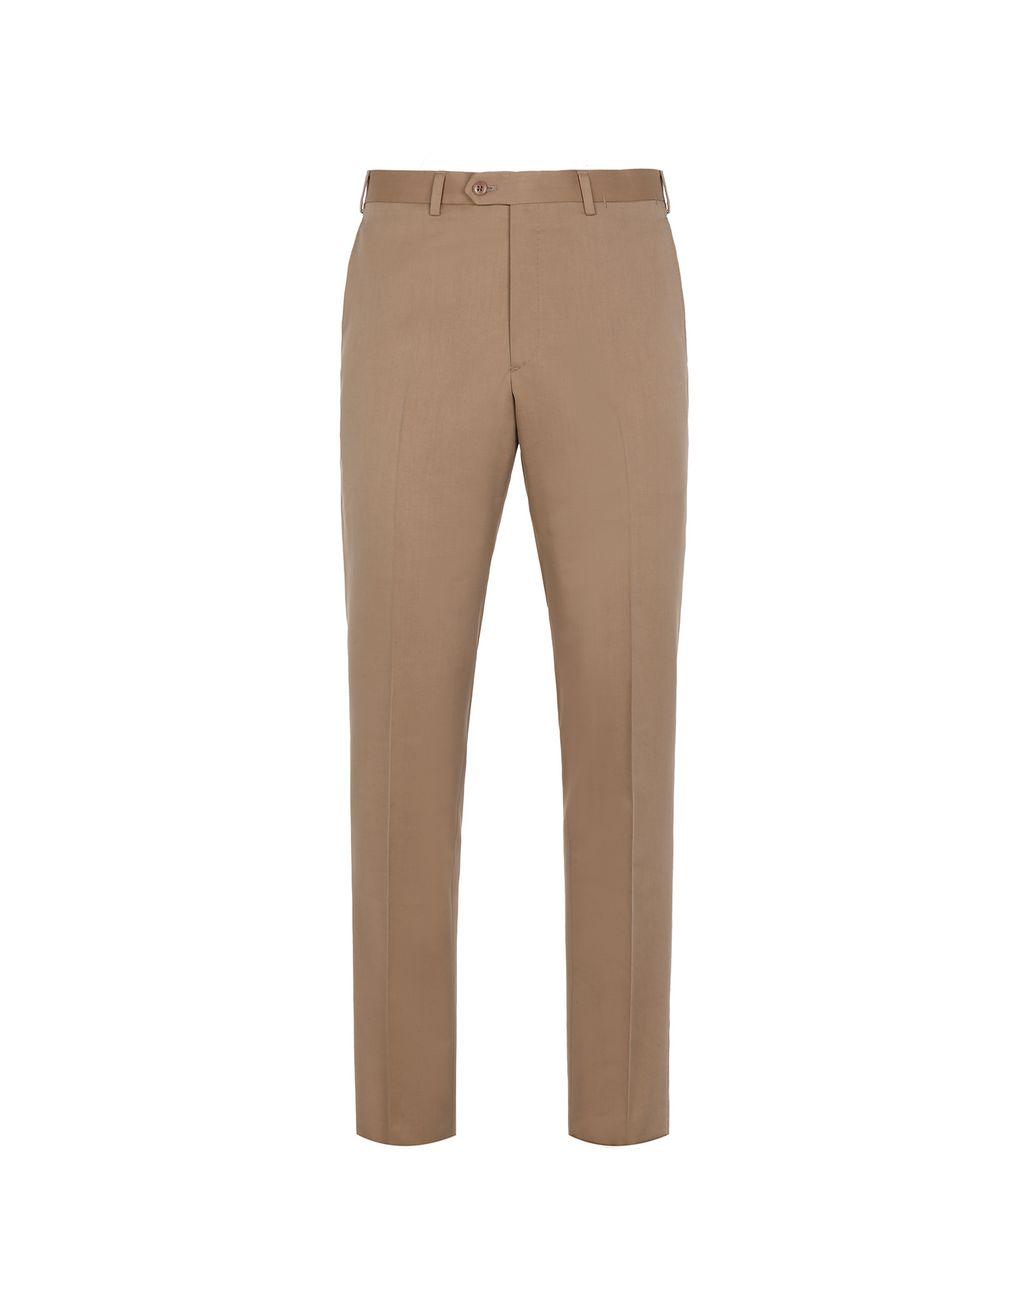 BRIONI Beige Megeve Trousers Trousers Man f